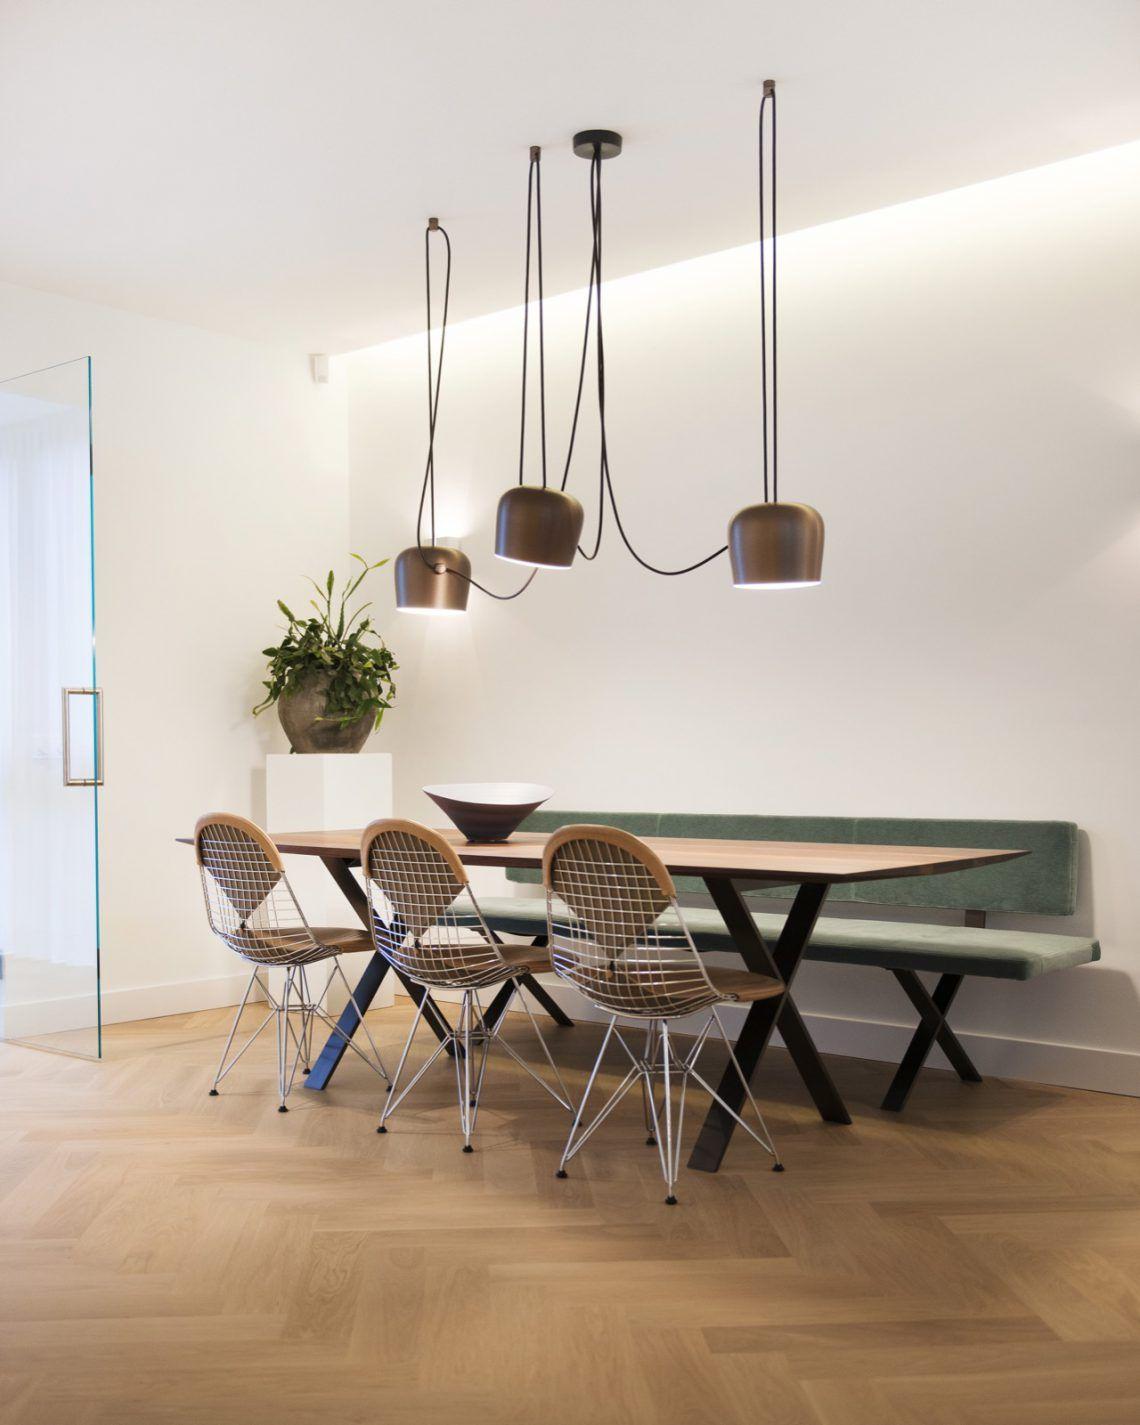 Novalis O Exclusieve Design Interieurs Modern Interieur Met  # Muebles Nebra Salones